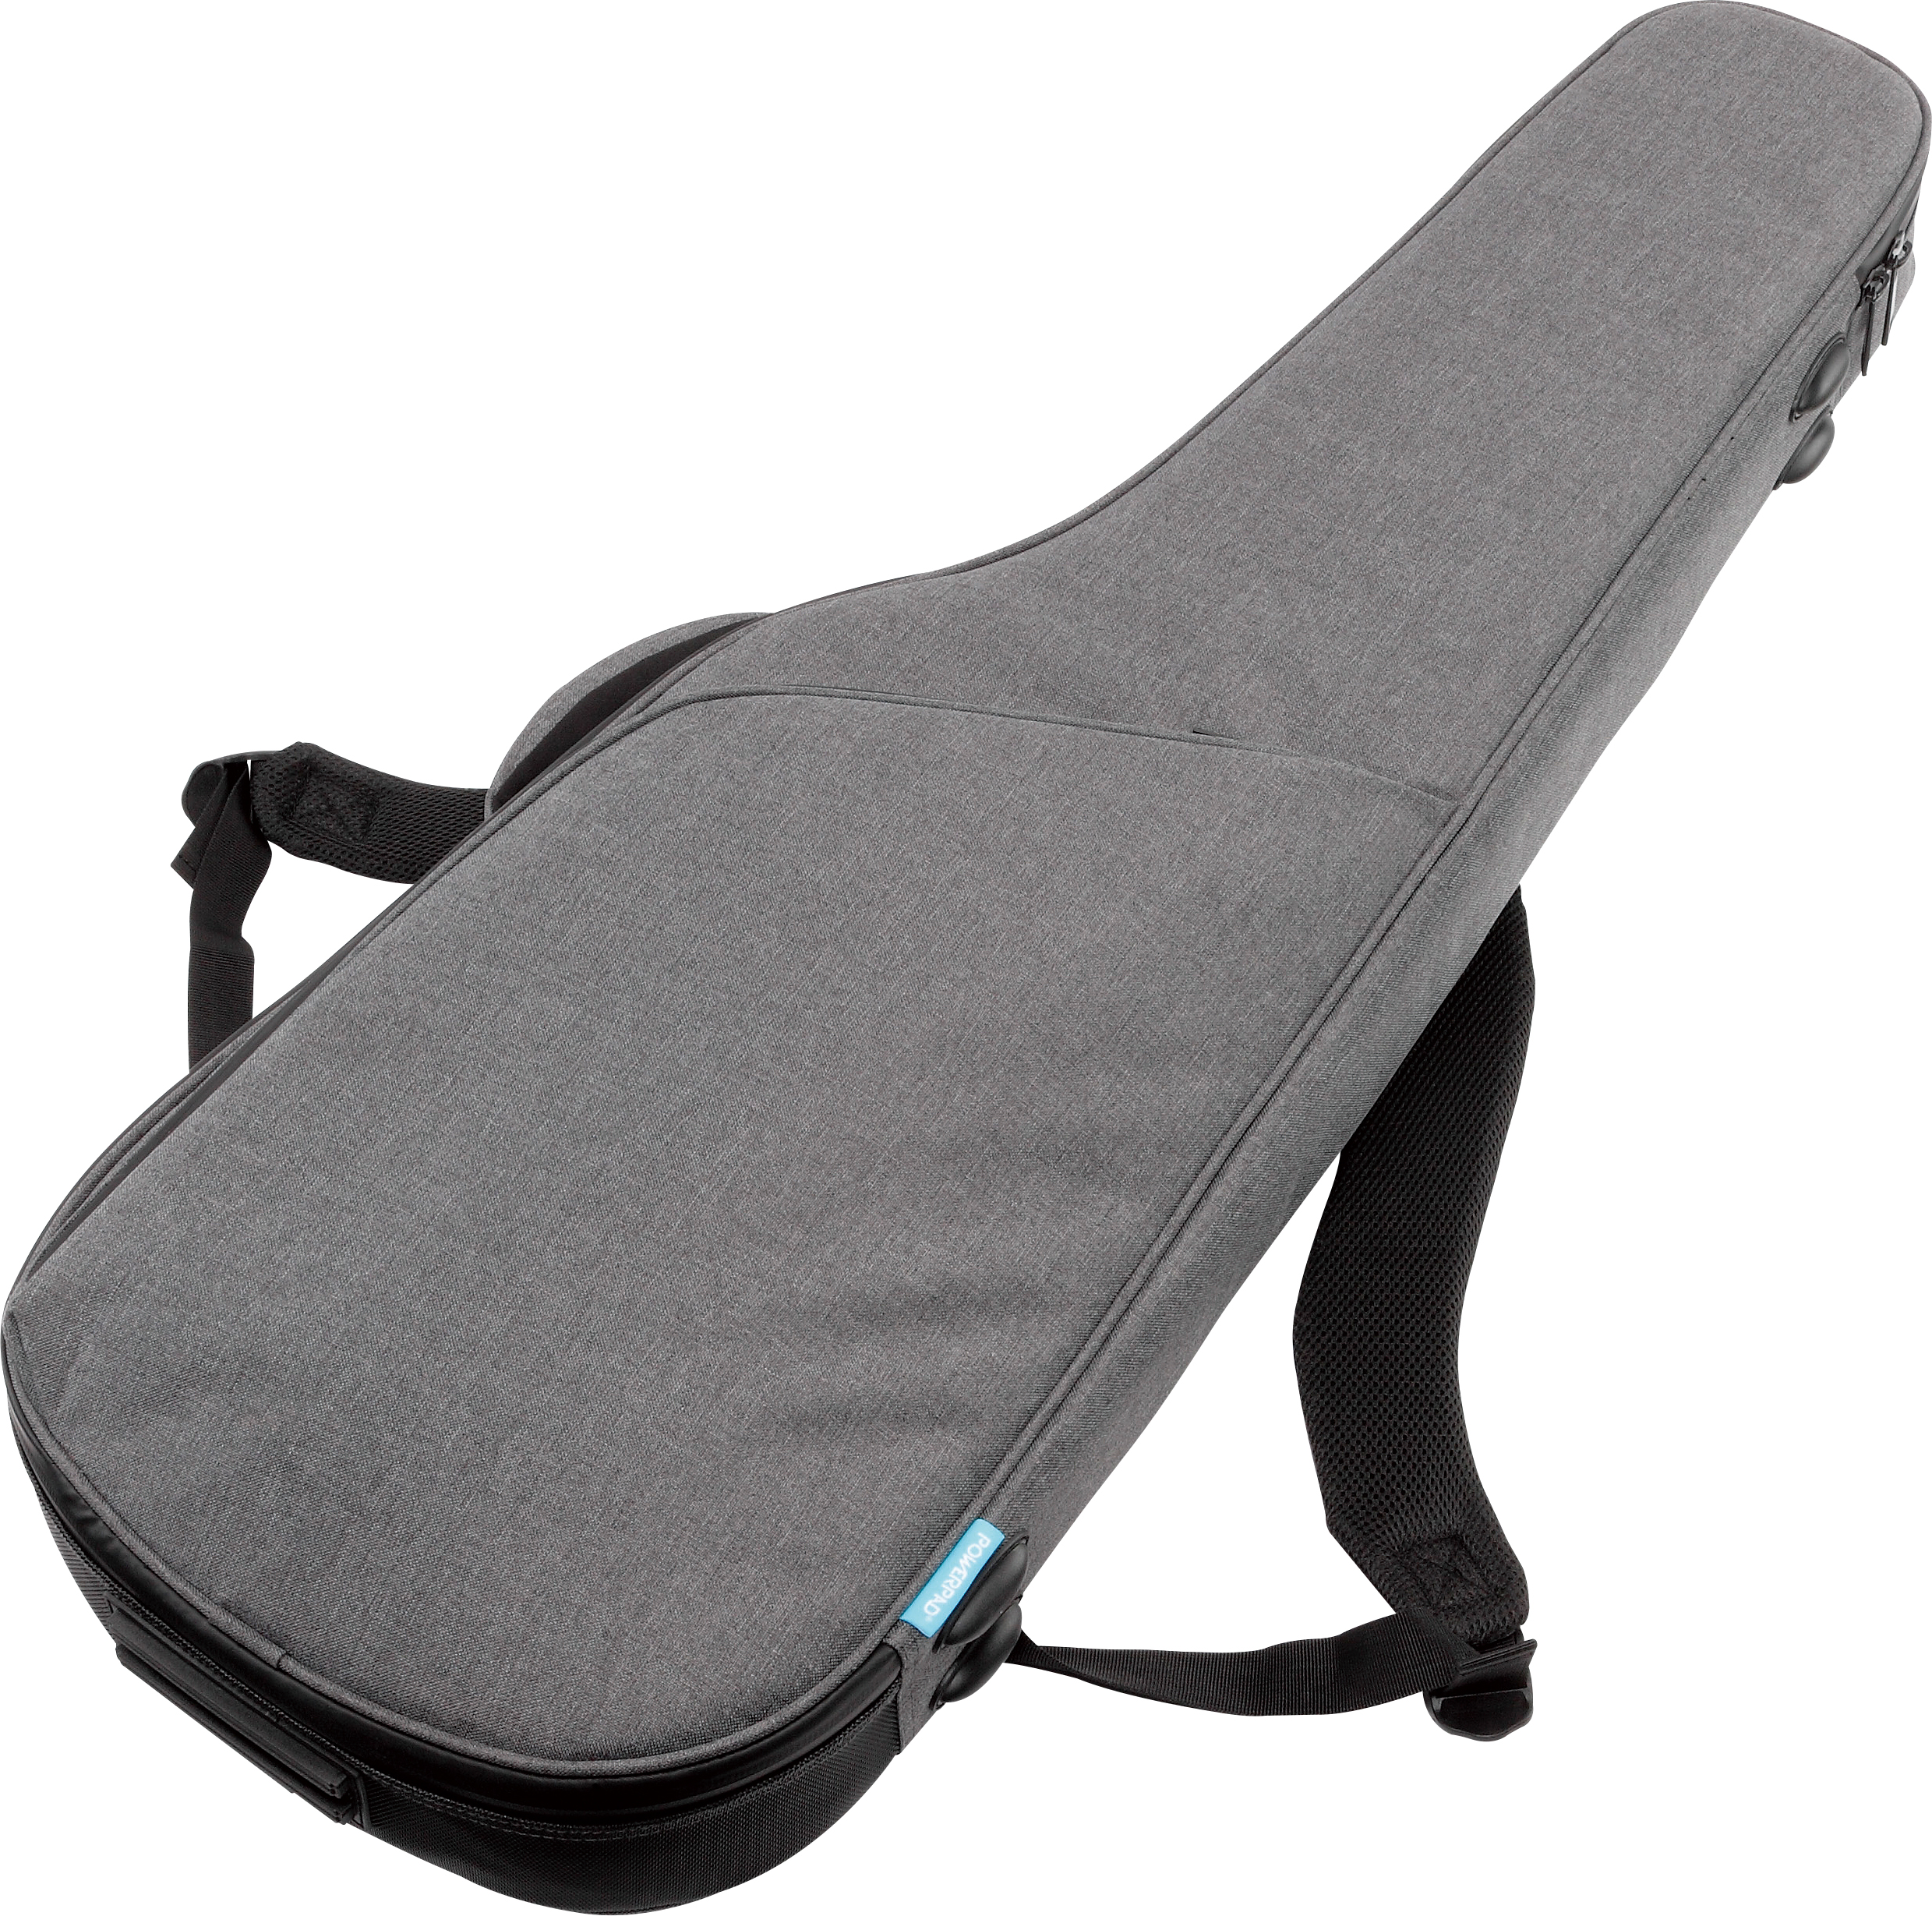 IBANEZ POWERPAD® Gigbag E-Gitarre PREMIUM charcoal grey